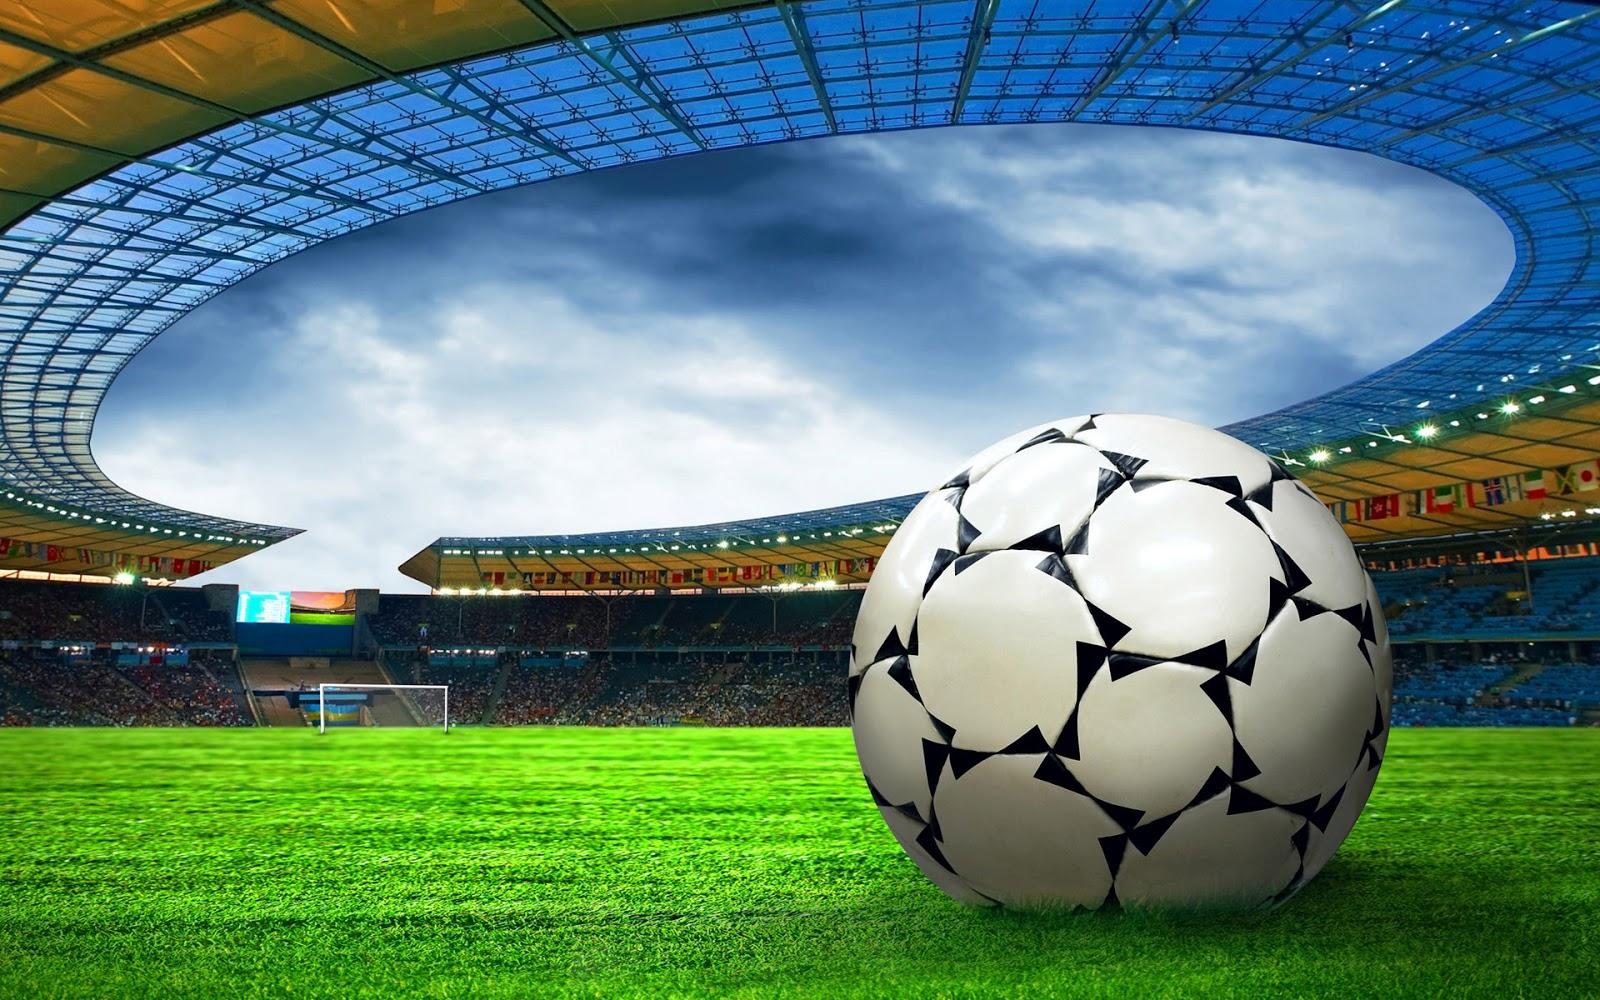 wallpaper galeries: sport hd wallpaper, hd sports wallpapers